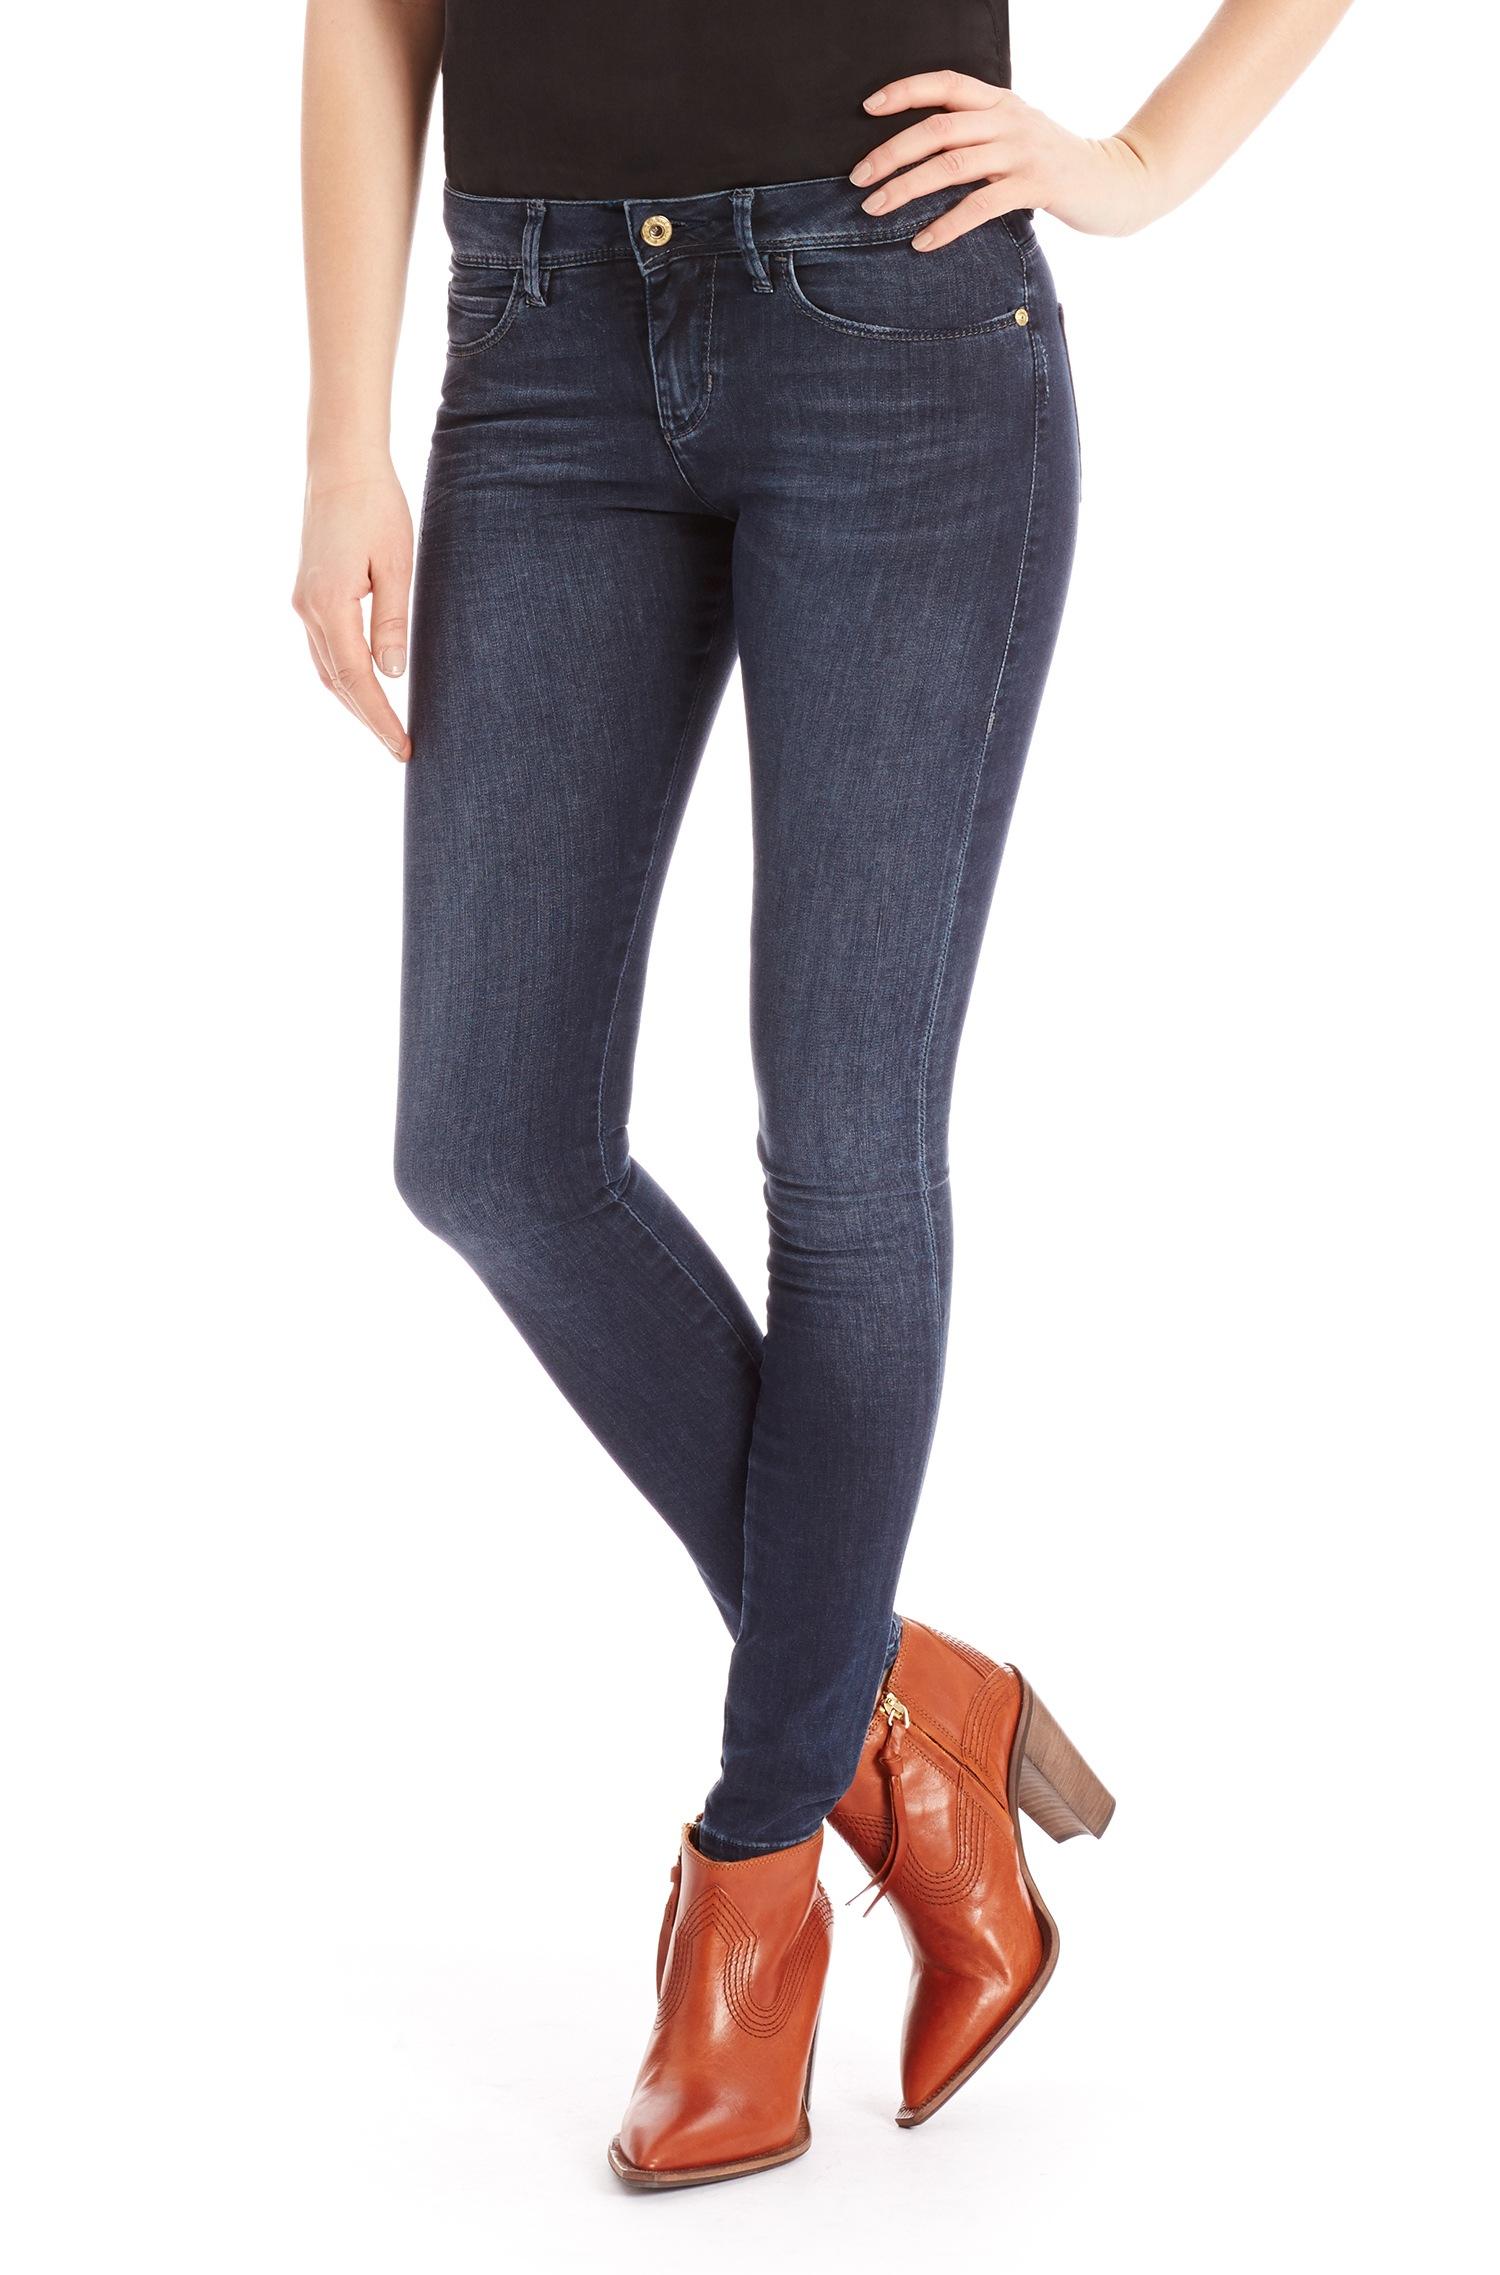 boss orange 39 liamy2 39 stretch cotton blend skinny jeans. Black Bedroom Furniture Sets. Home Design Ideas